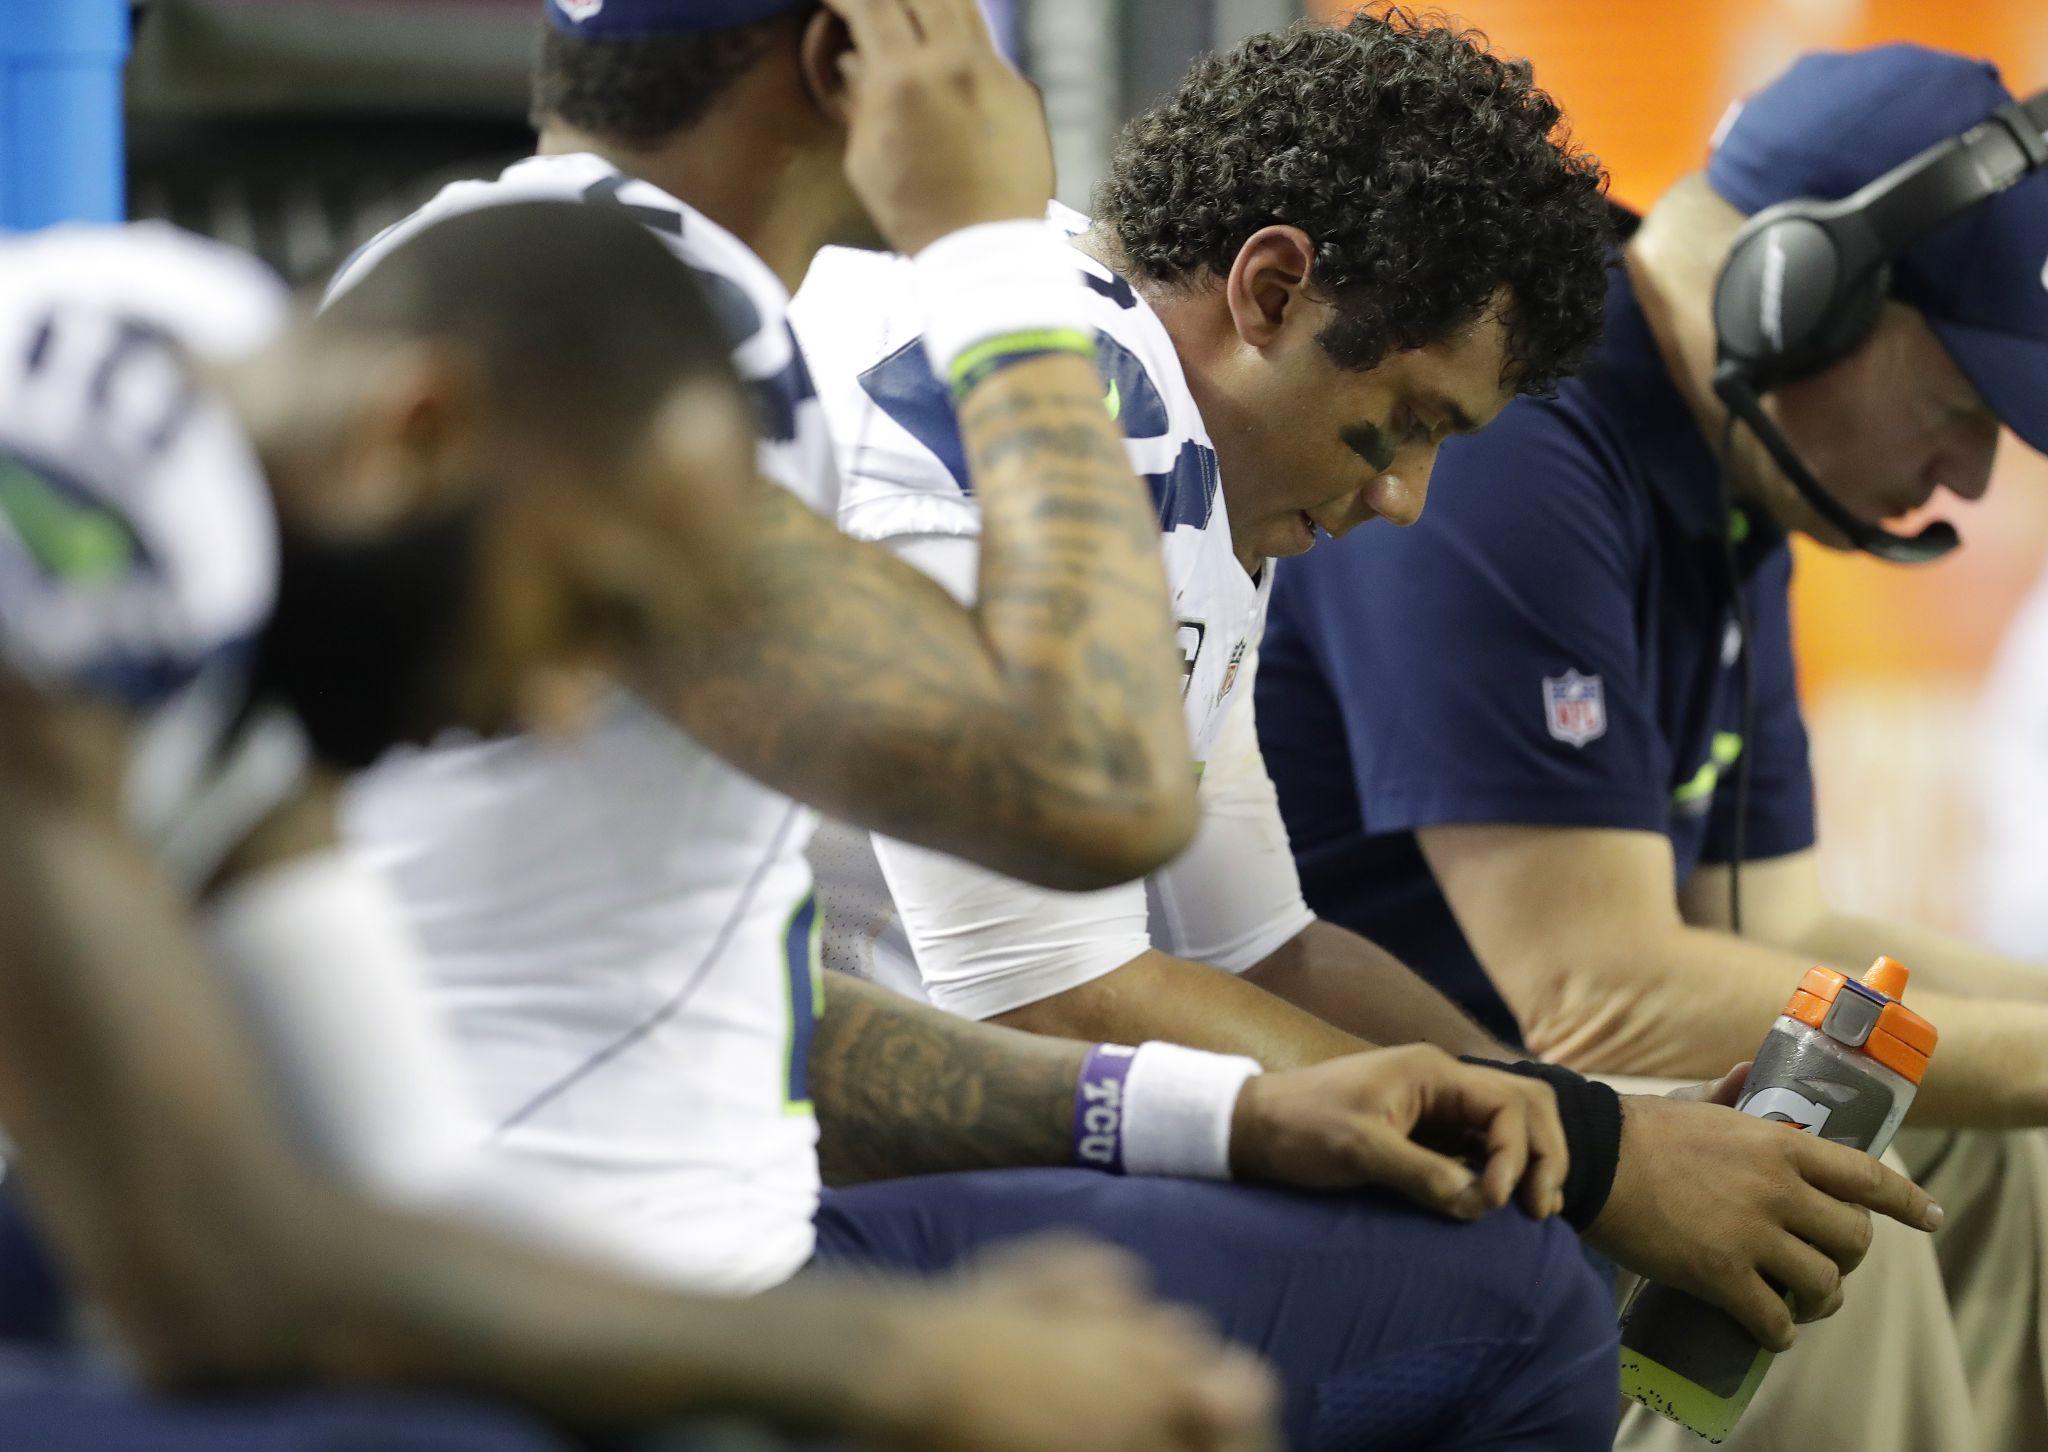 Injuries Penalty Shift Momentum In Atlanta Win Over Seahawks Seahawks Win Or Lose Atlanta